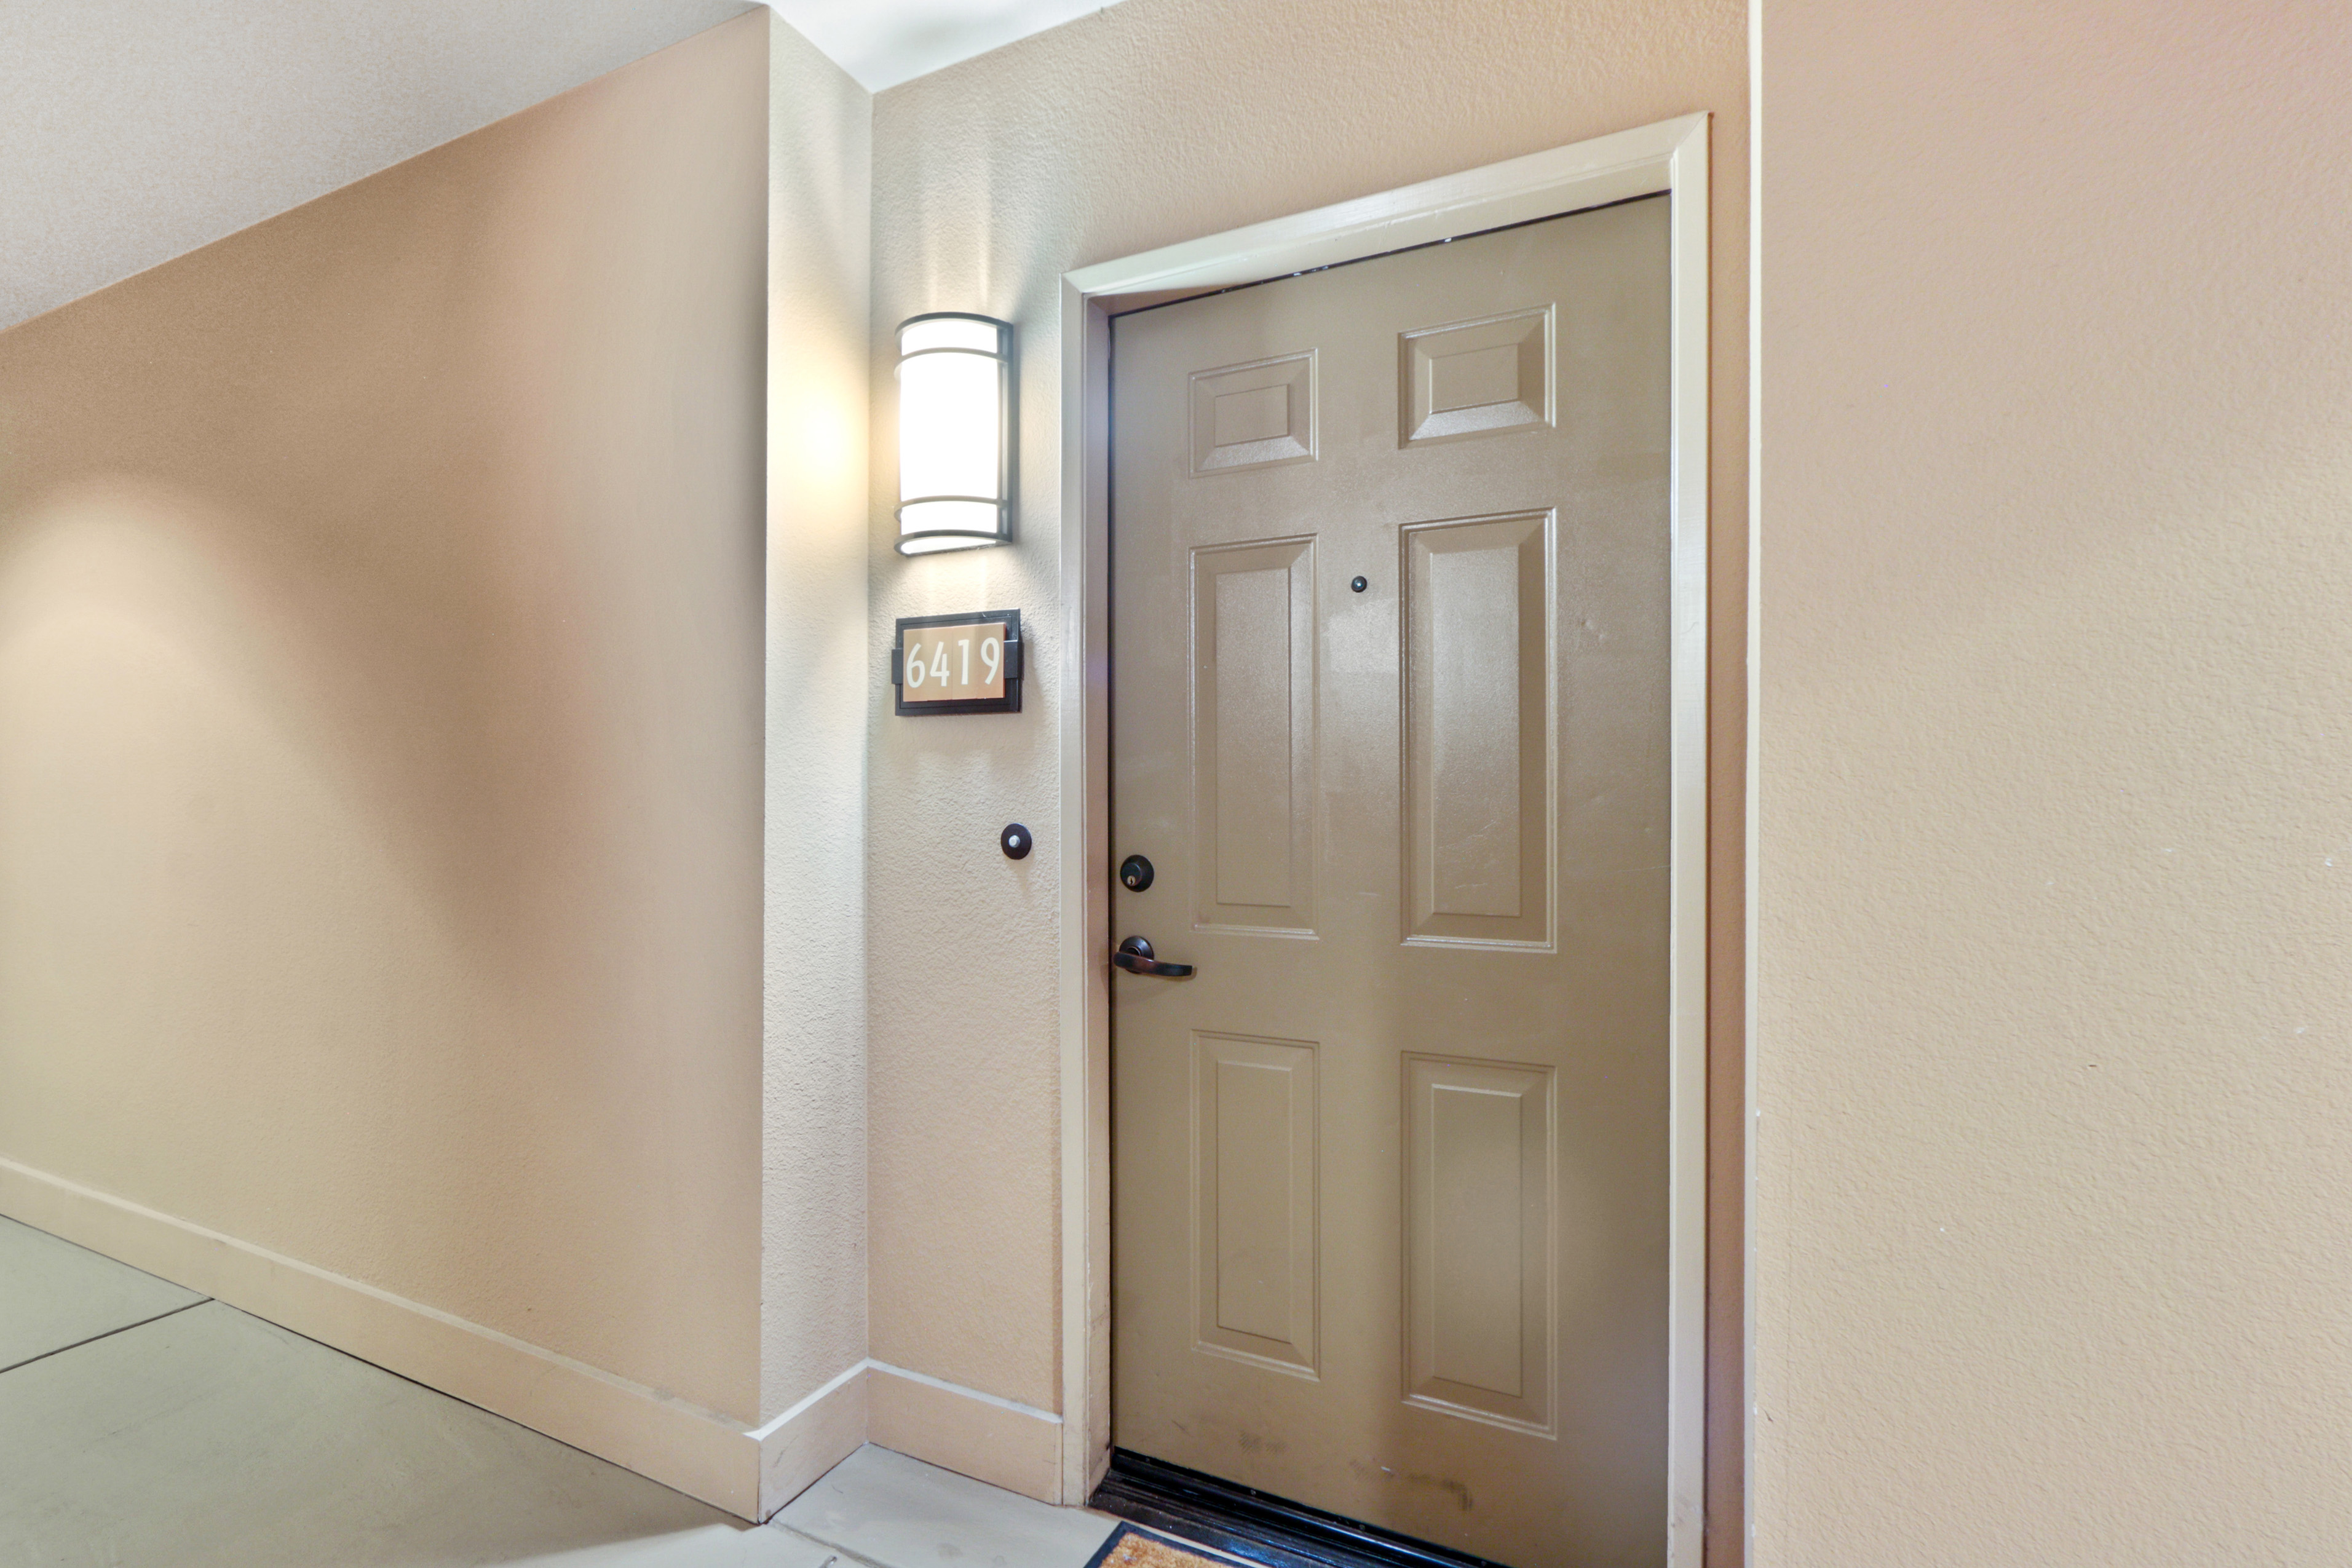 image 2 furnished 2 bedroom Apartment for rent in Irvine, Orange County